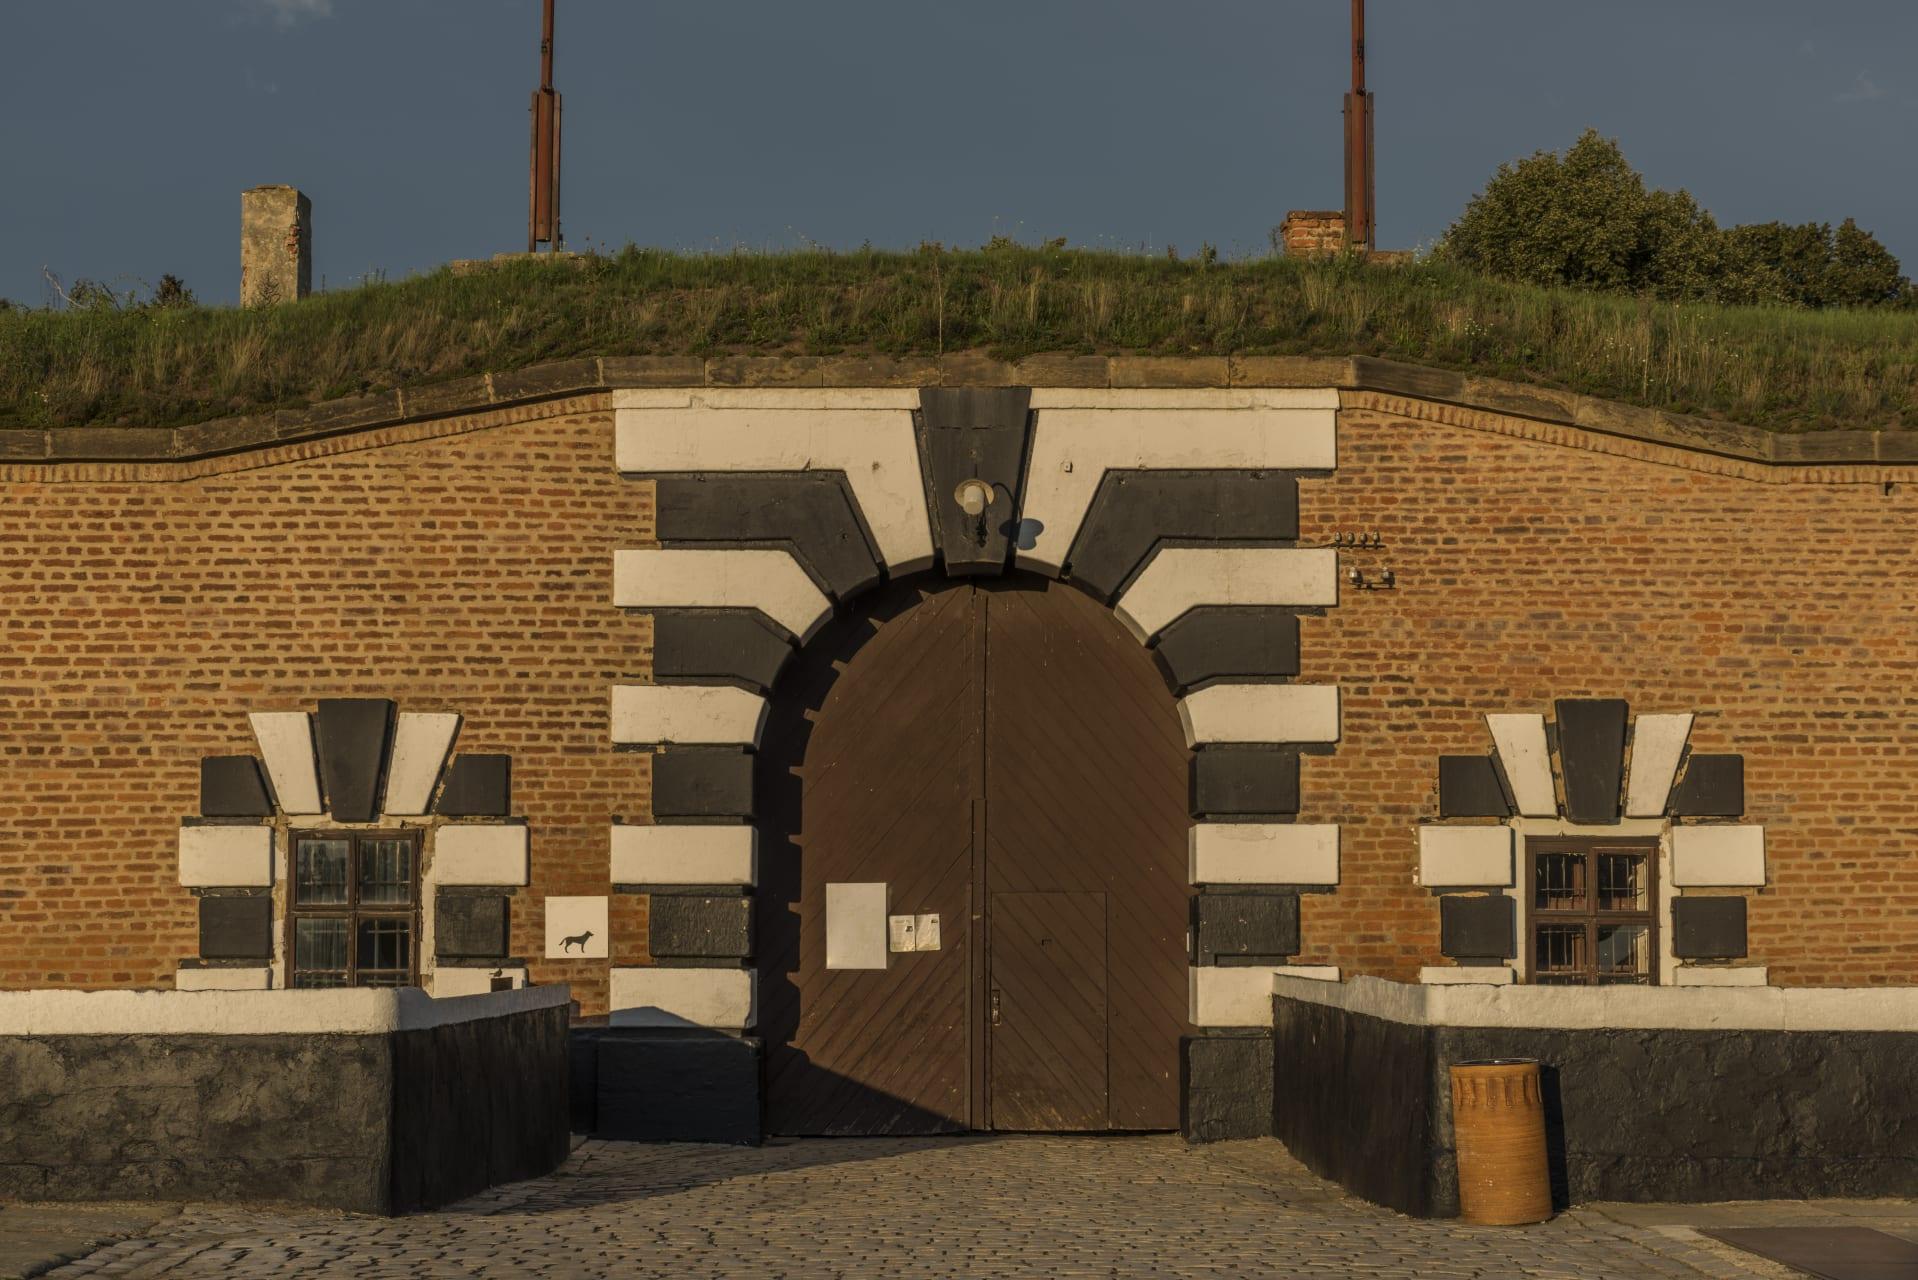 Terezin - Terezin Big Fortress: Jewish Ghetto with interiors - part II